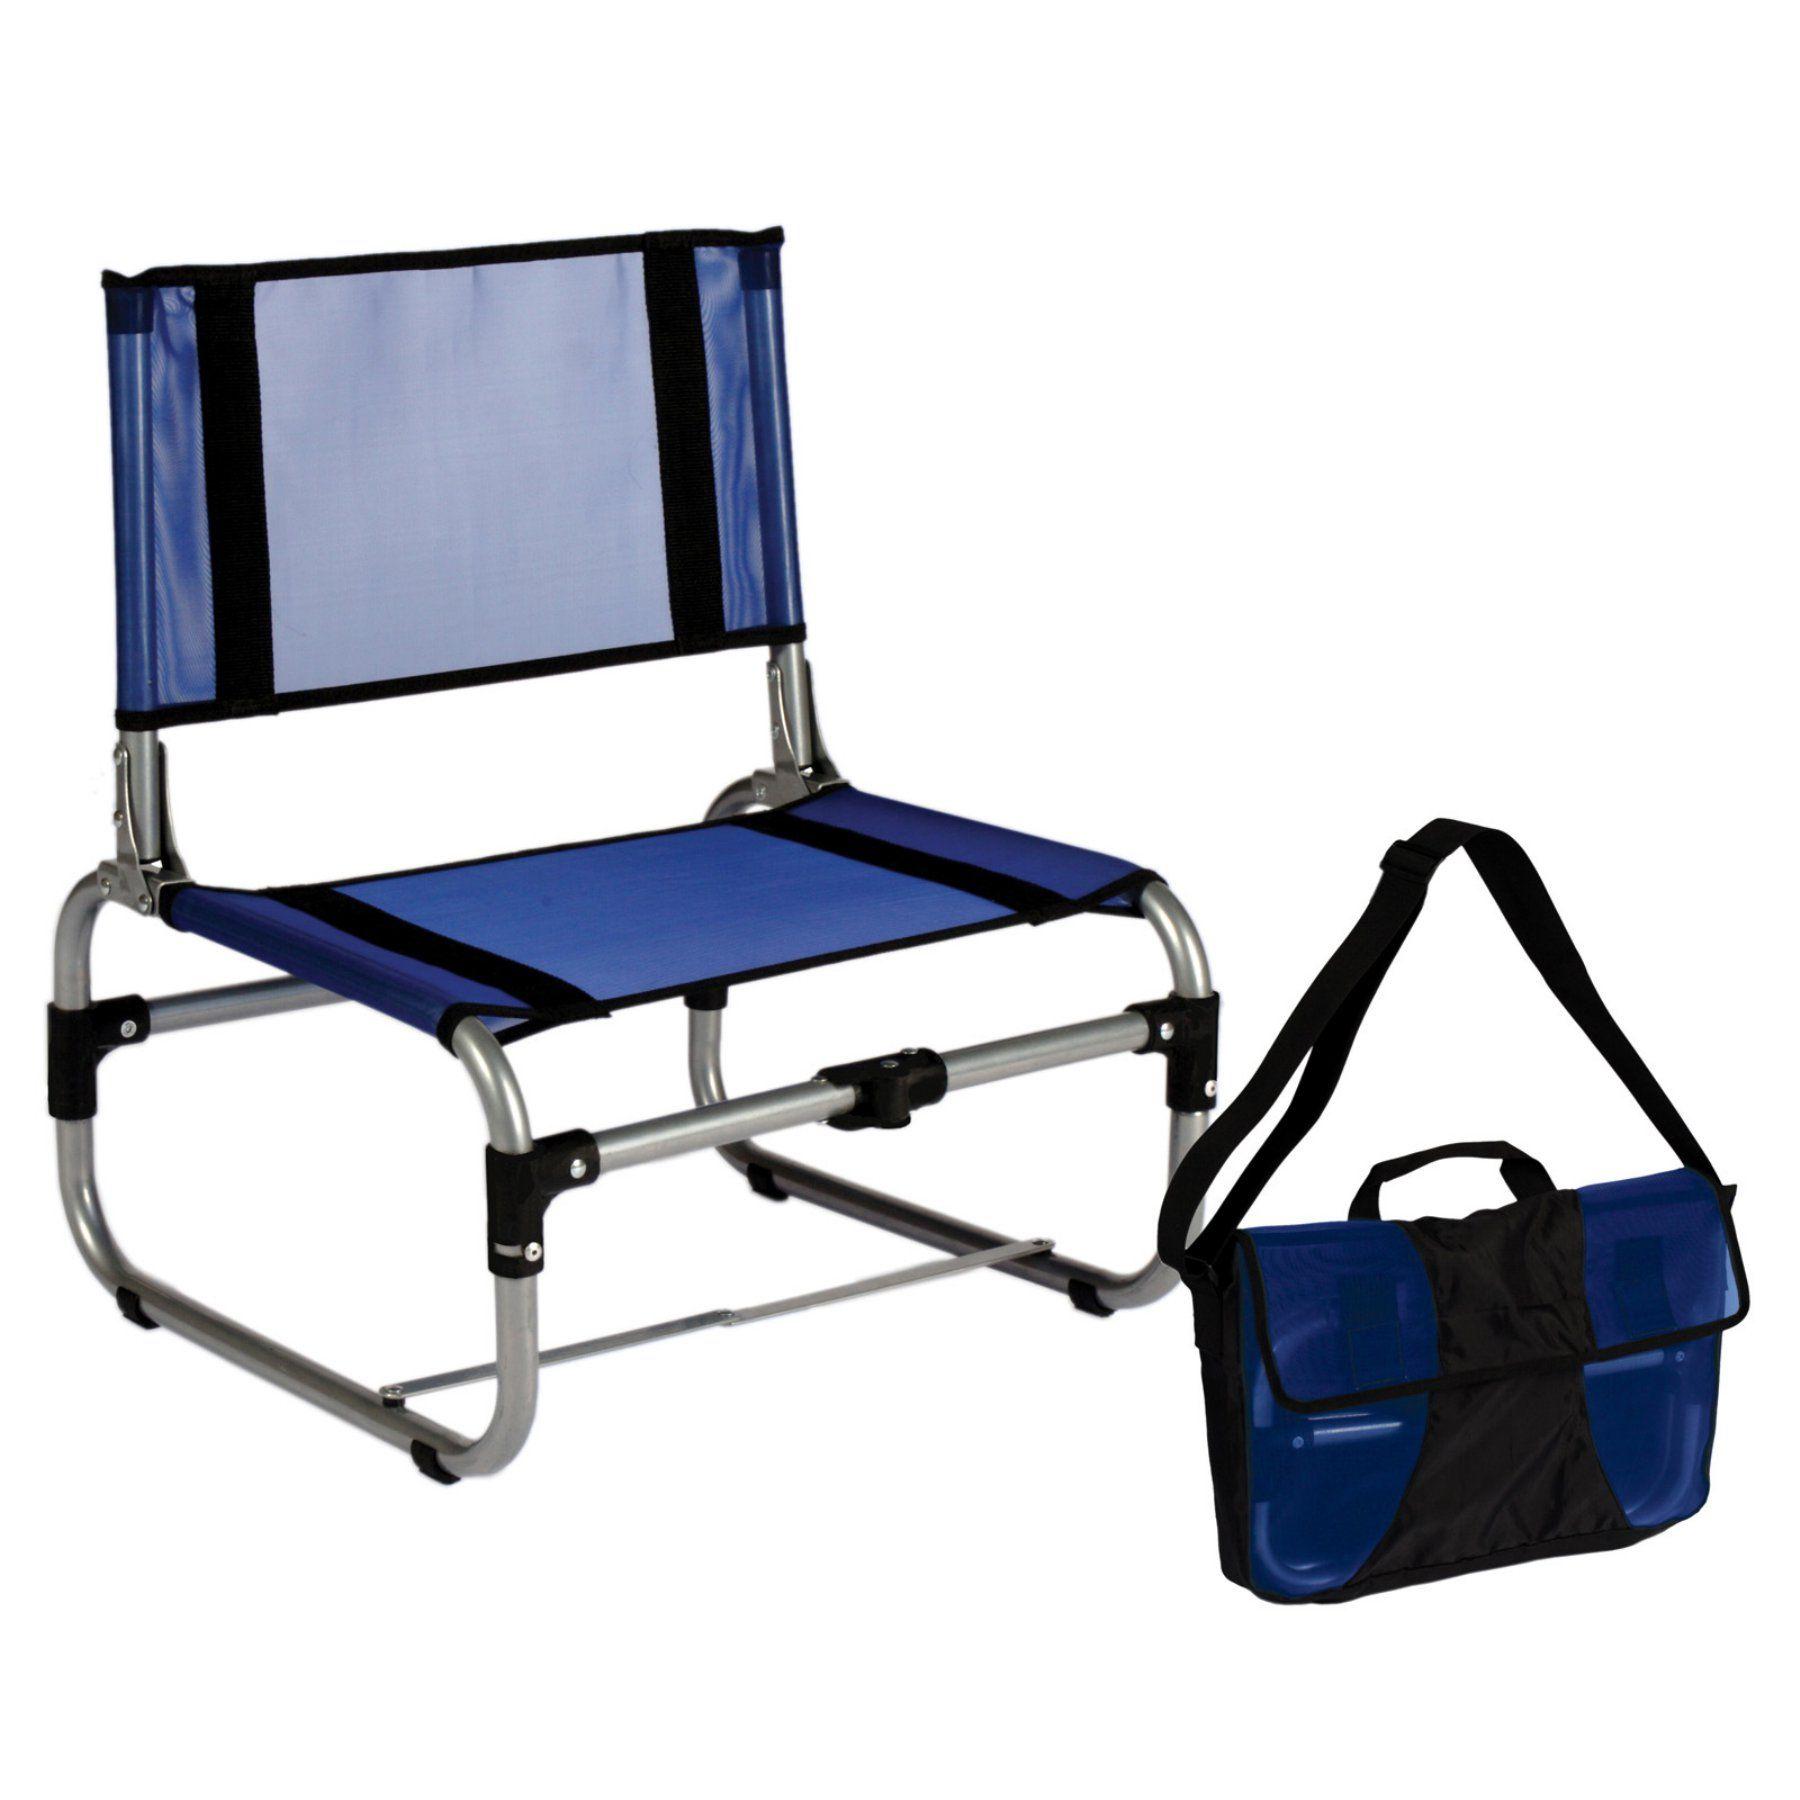 Outdoor The Travel Chair Larry Chair 169bk Kayak Seats Portable Chair Folding Beach Chair